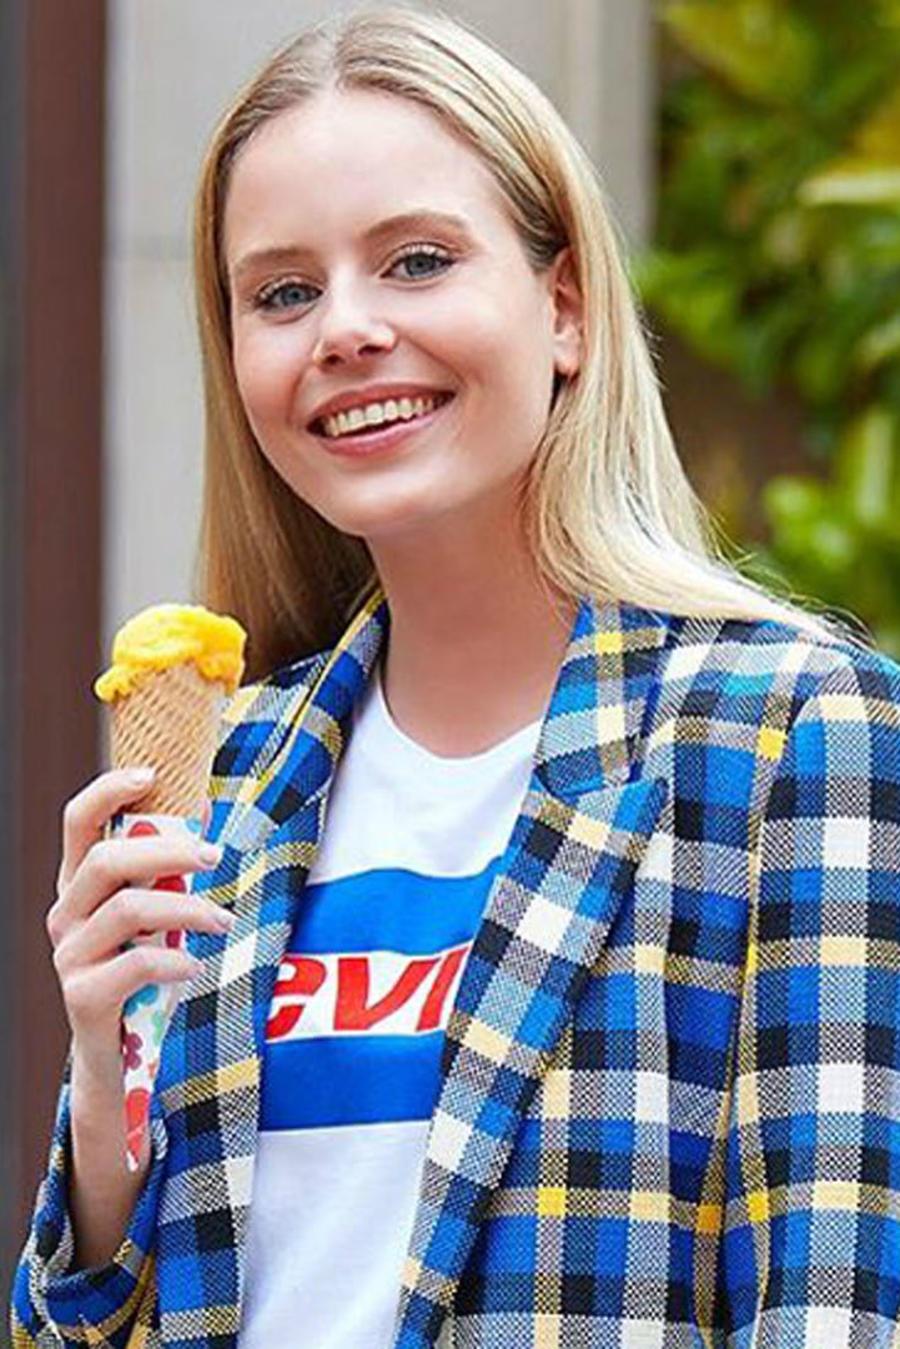 Natalie Ortega, Miss España 2019, Miss Universo 2019 comiendo helado